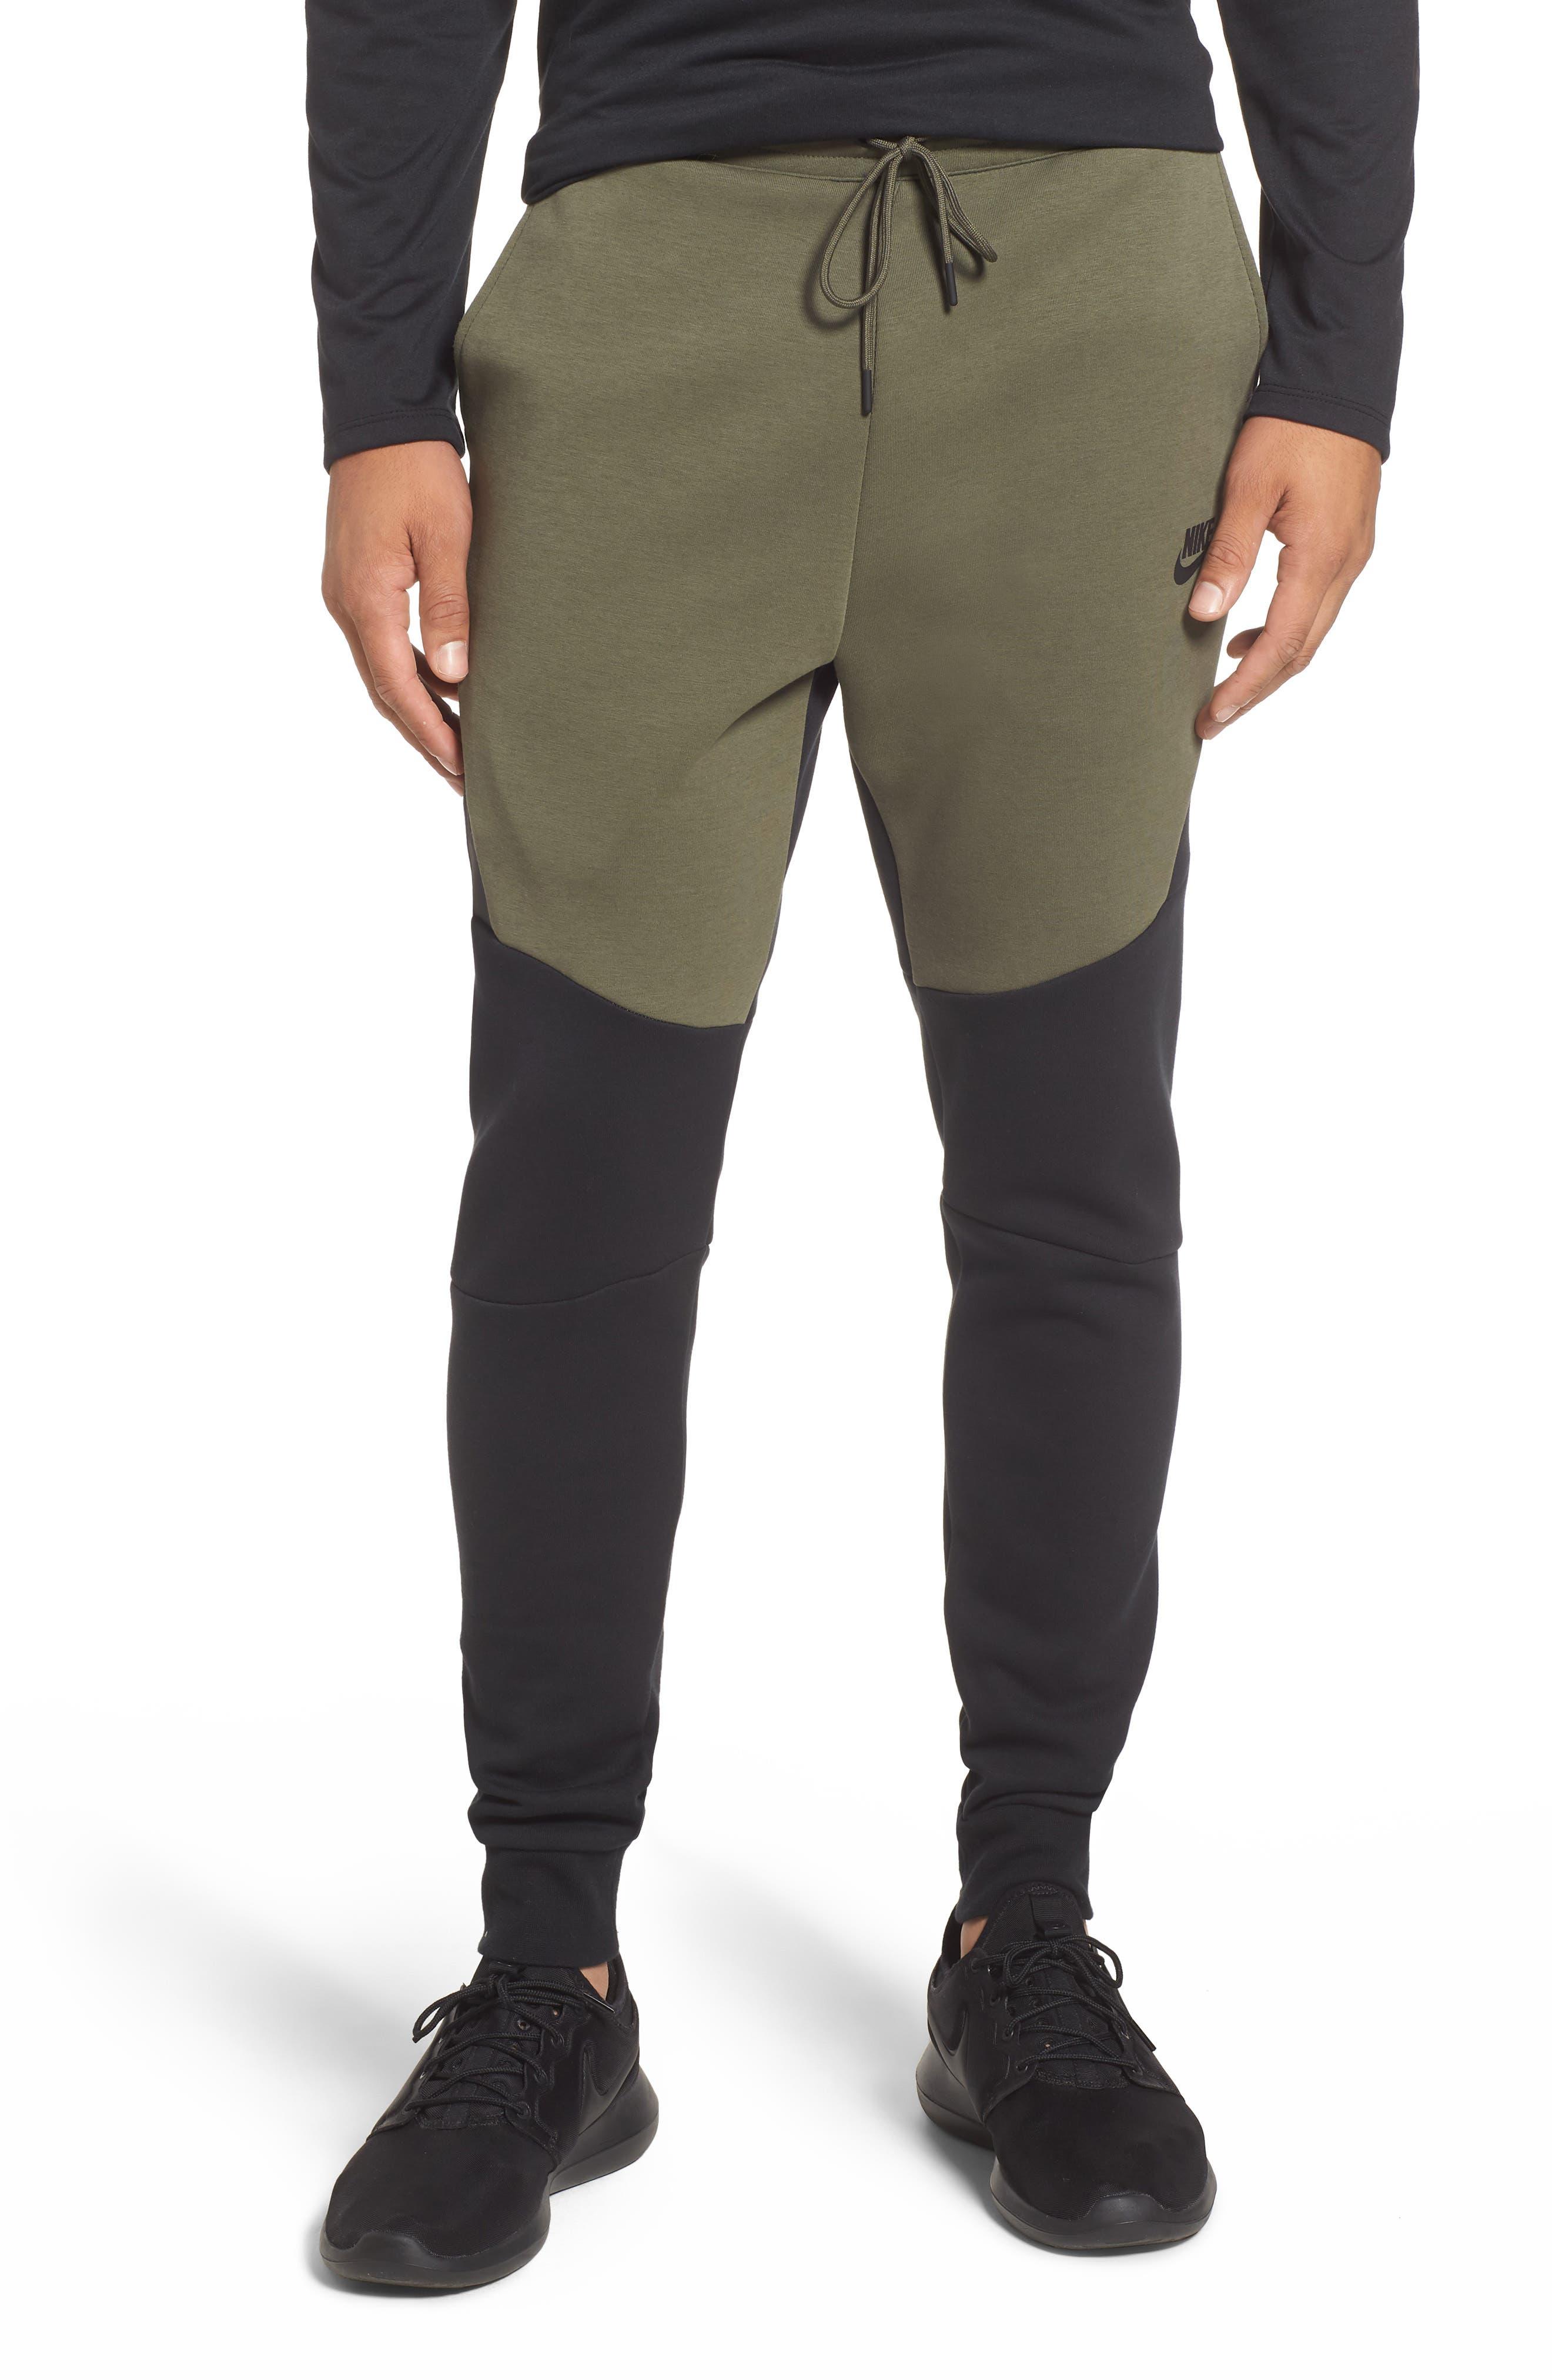 Tech Fleece Jogger Pants,                             Main thumbnail 1, color,                             BLACK/ TWILIGHT MARSH/ BLACK